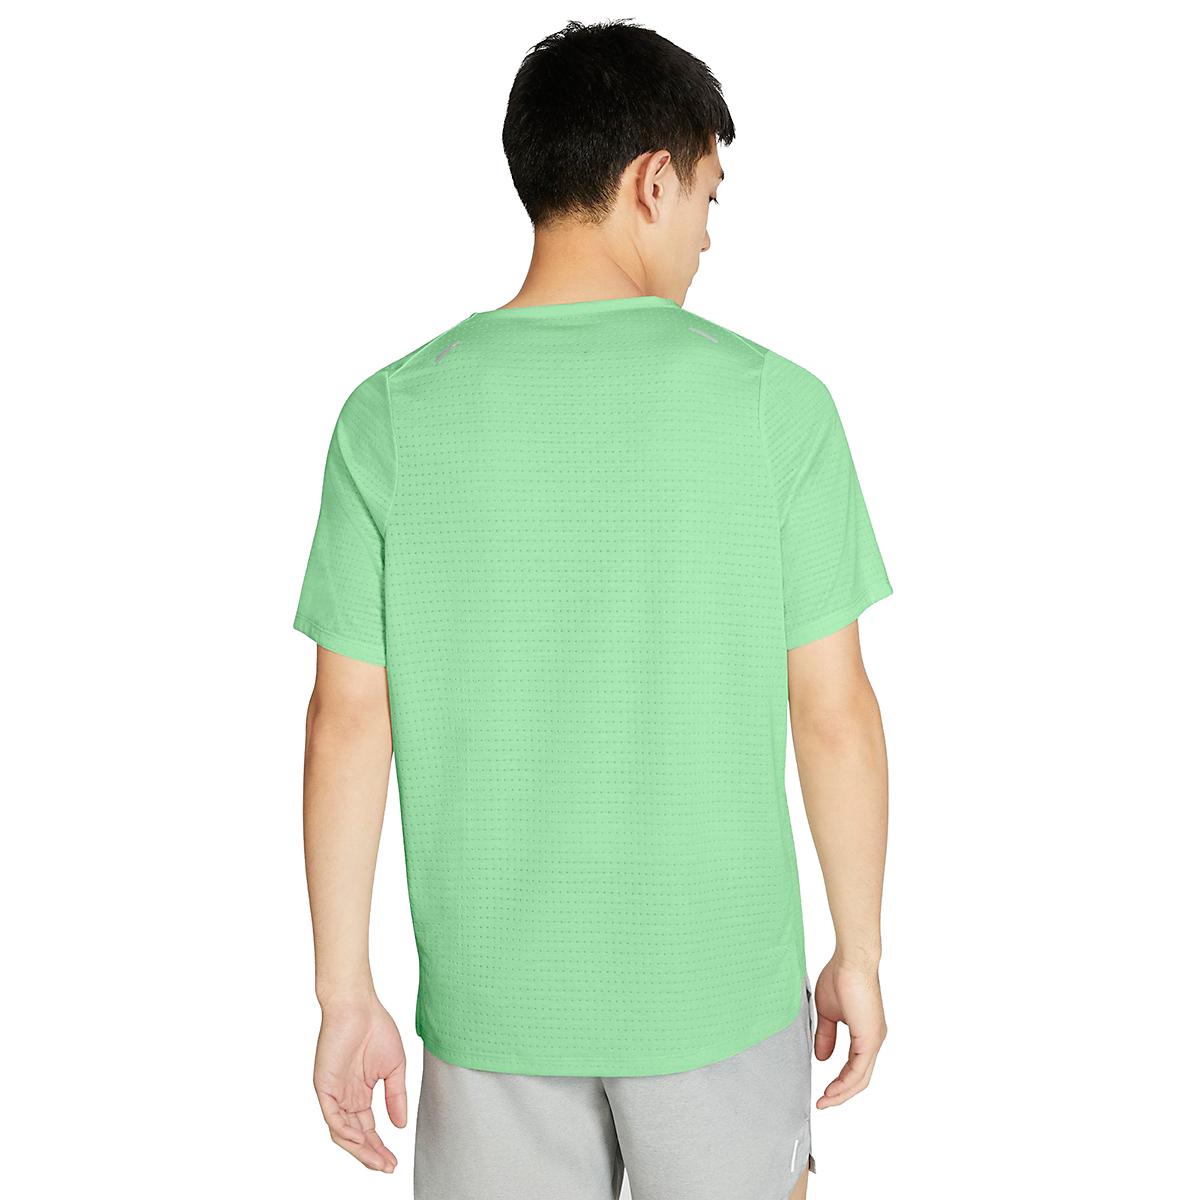 Men's Nike Rise 365 Short Sleeve  - Color: Cucumber Calm - Size: S, Cucumber Calm, large, image 2